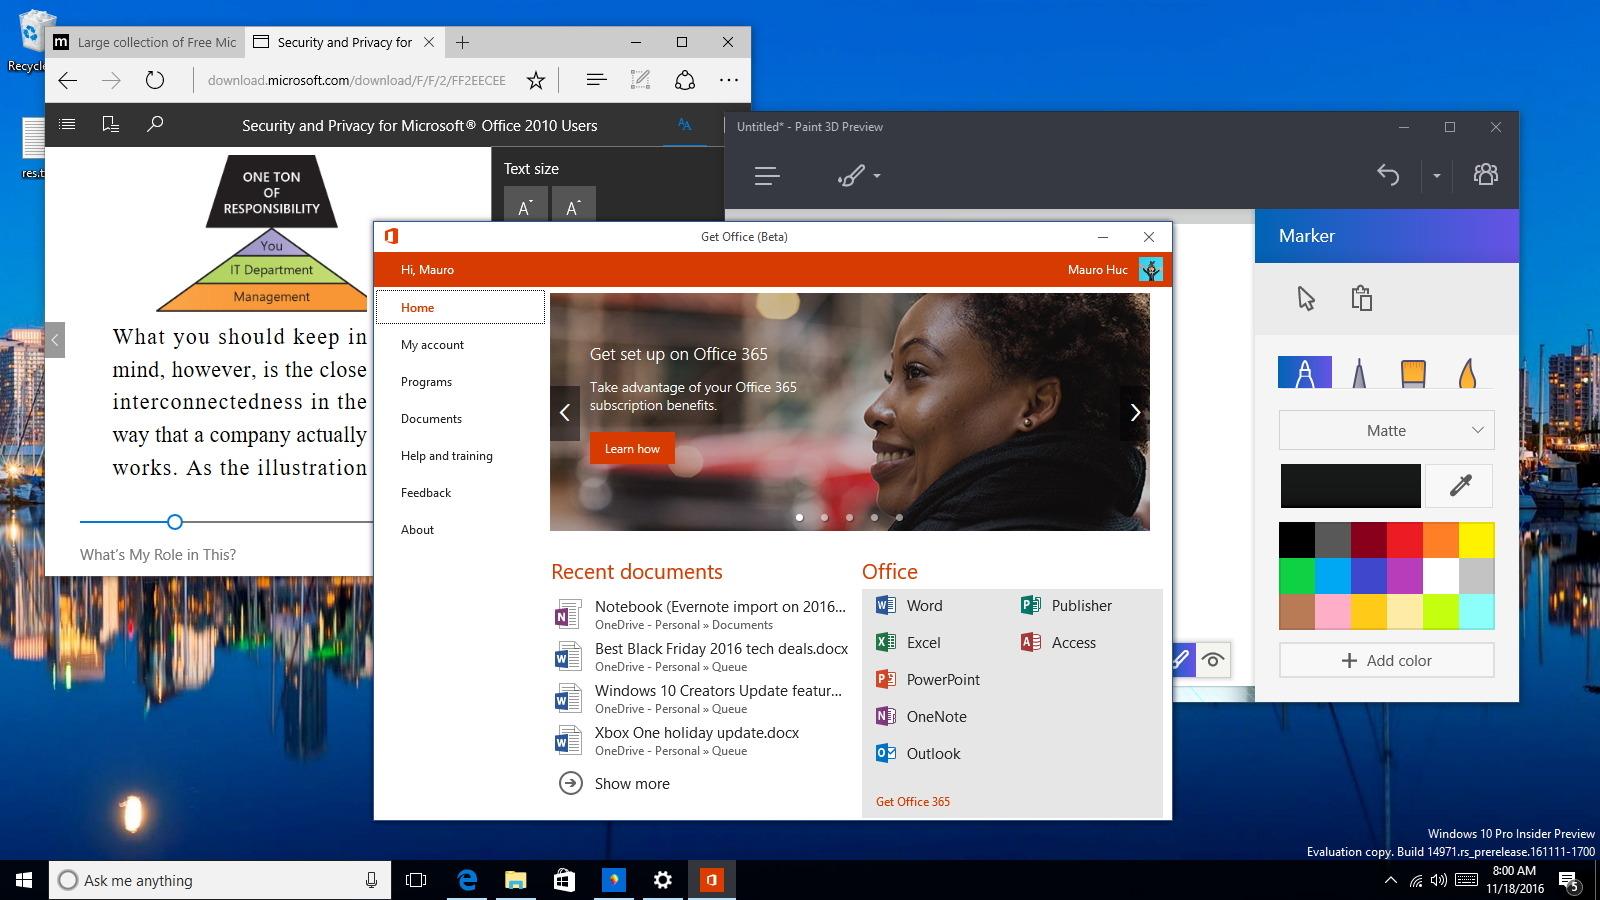 Windows 10 build 14971